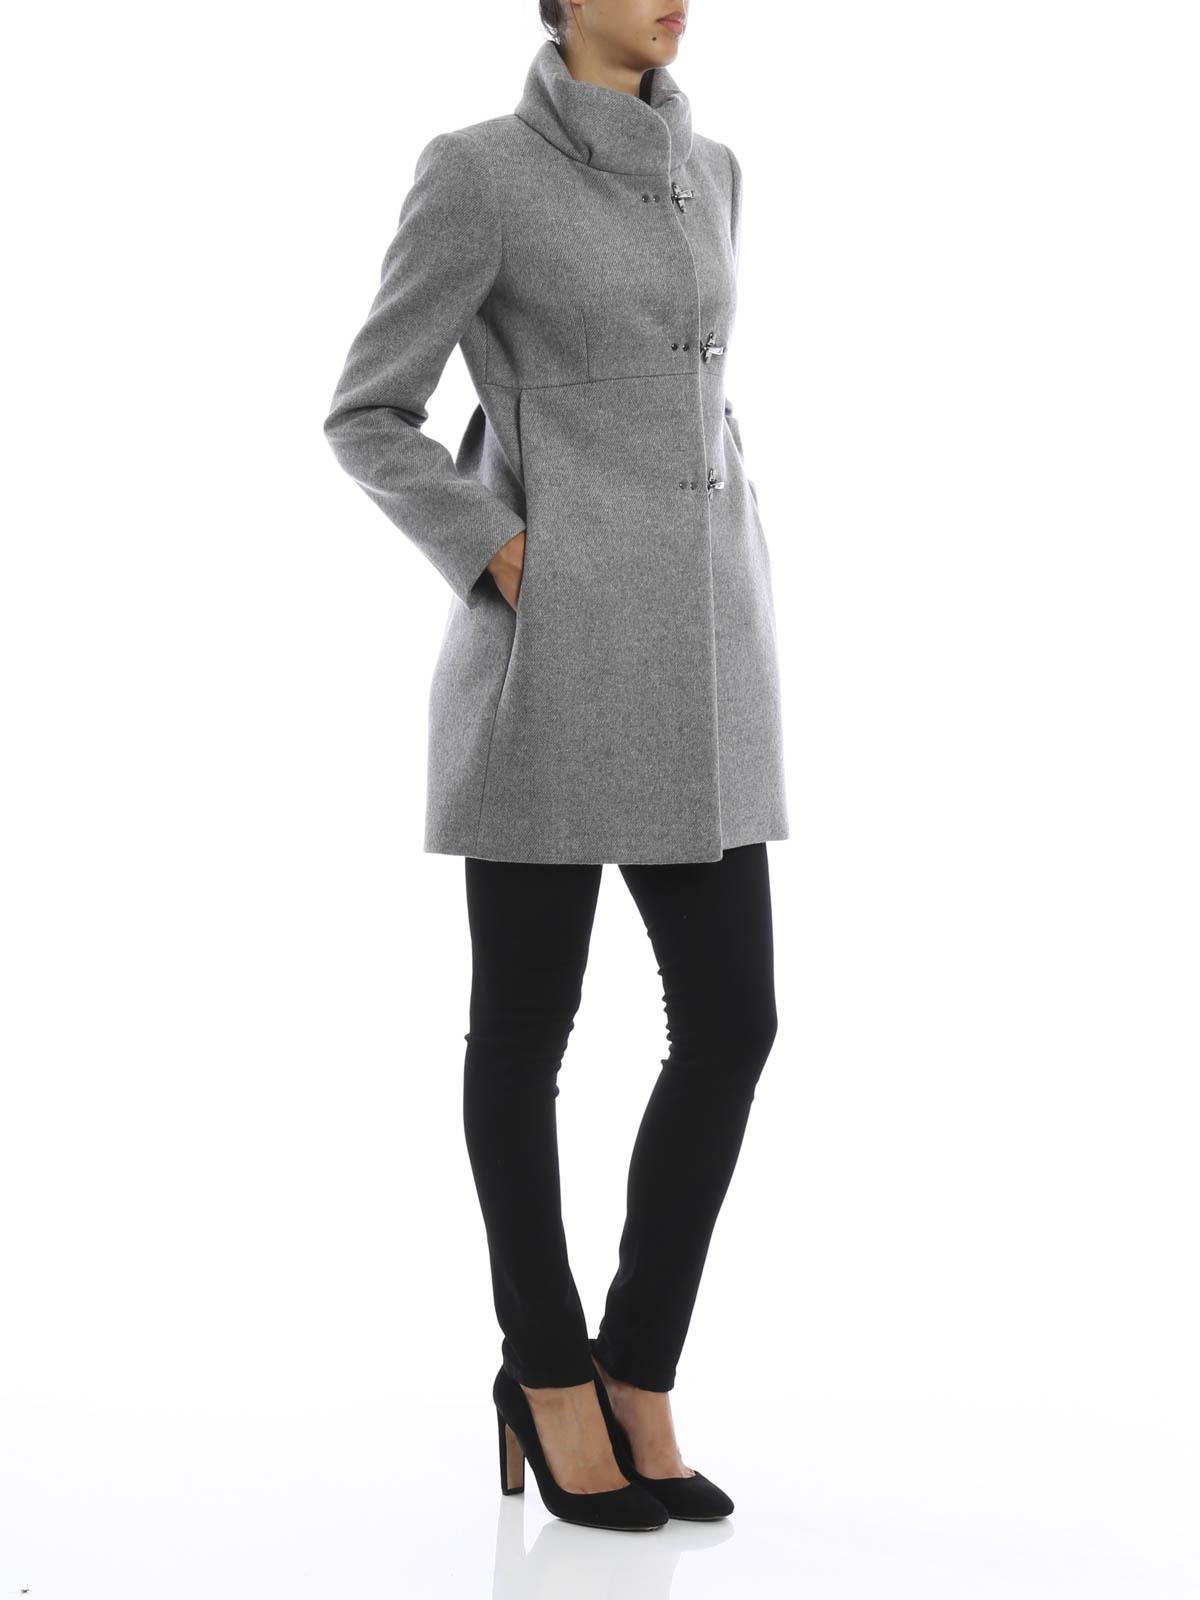 sports shoes 41296 073c2 Fay - Wool blend coat - short coats - NAW5033Y050 HAPB402 ...